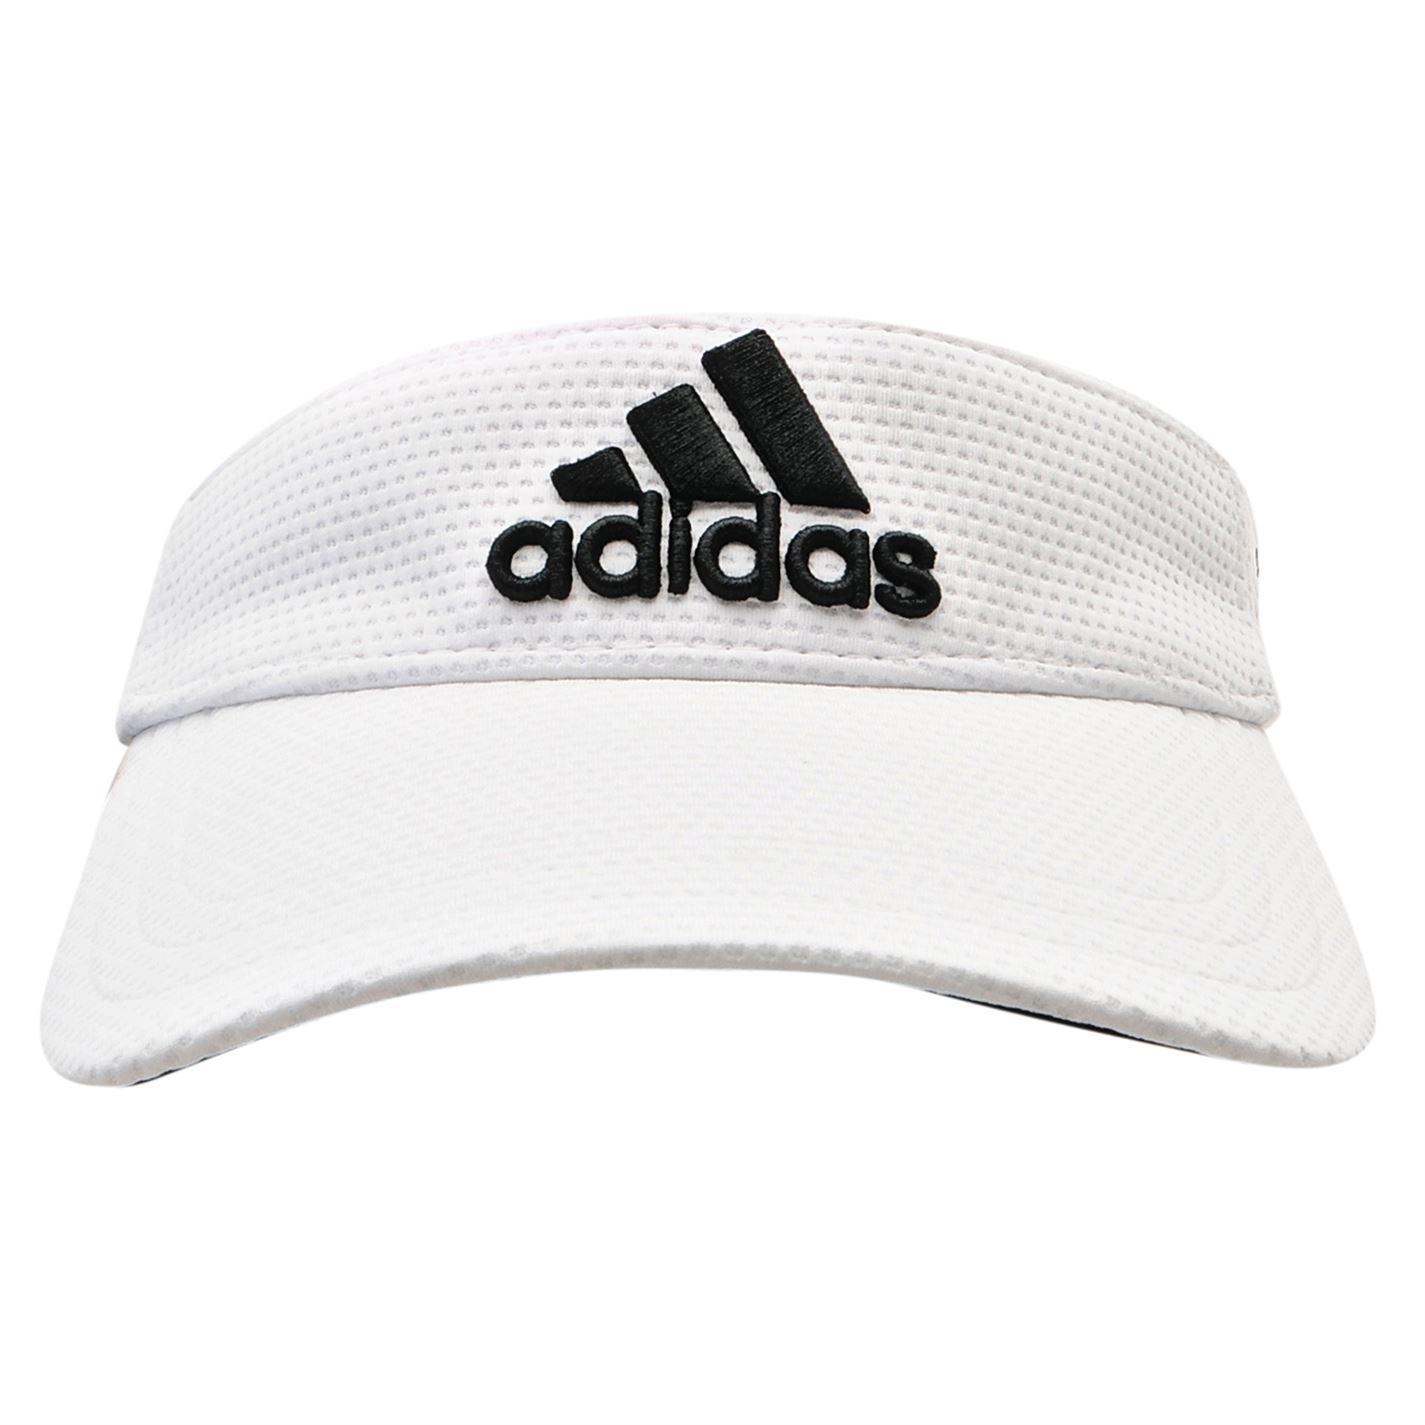 adidas golf tour visor cappy herren cap sonnenschirm. Black Bedroom Furniture Sets. Home Design Ideas